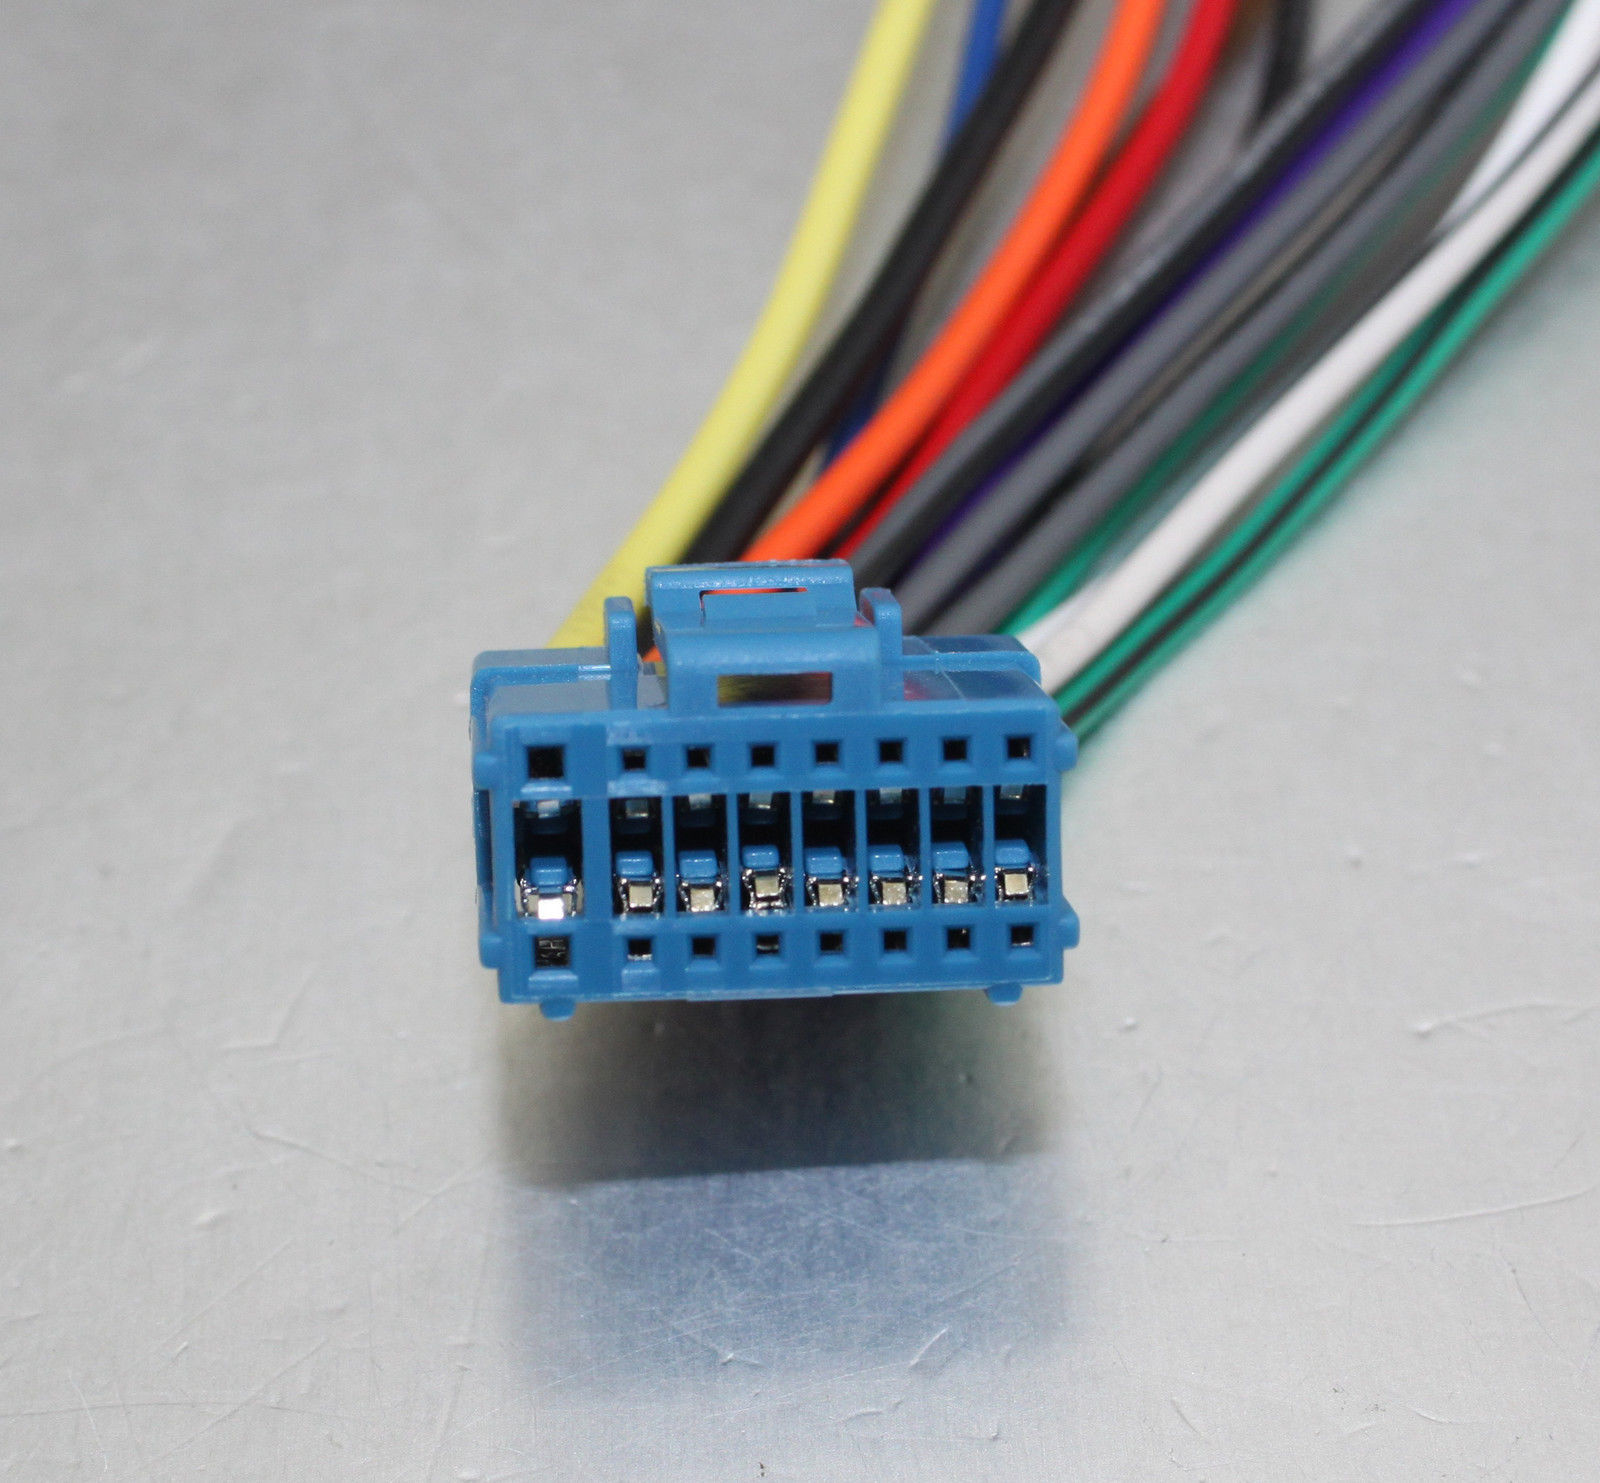 Aps Pioneer AVH-P6500DVD AVIC-N1 AVIC-N2 and 29 similar items on stereo amp wiring, subwoofer wiring, kenwood stereo wiring, dvd player wiring,